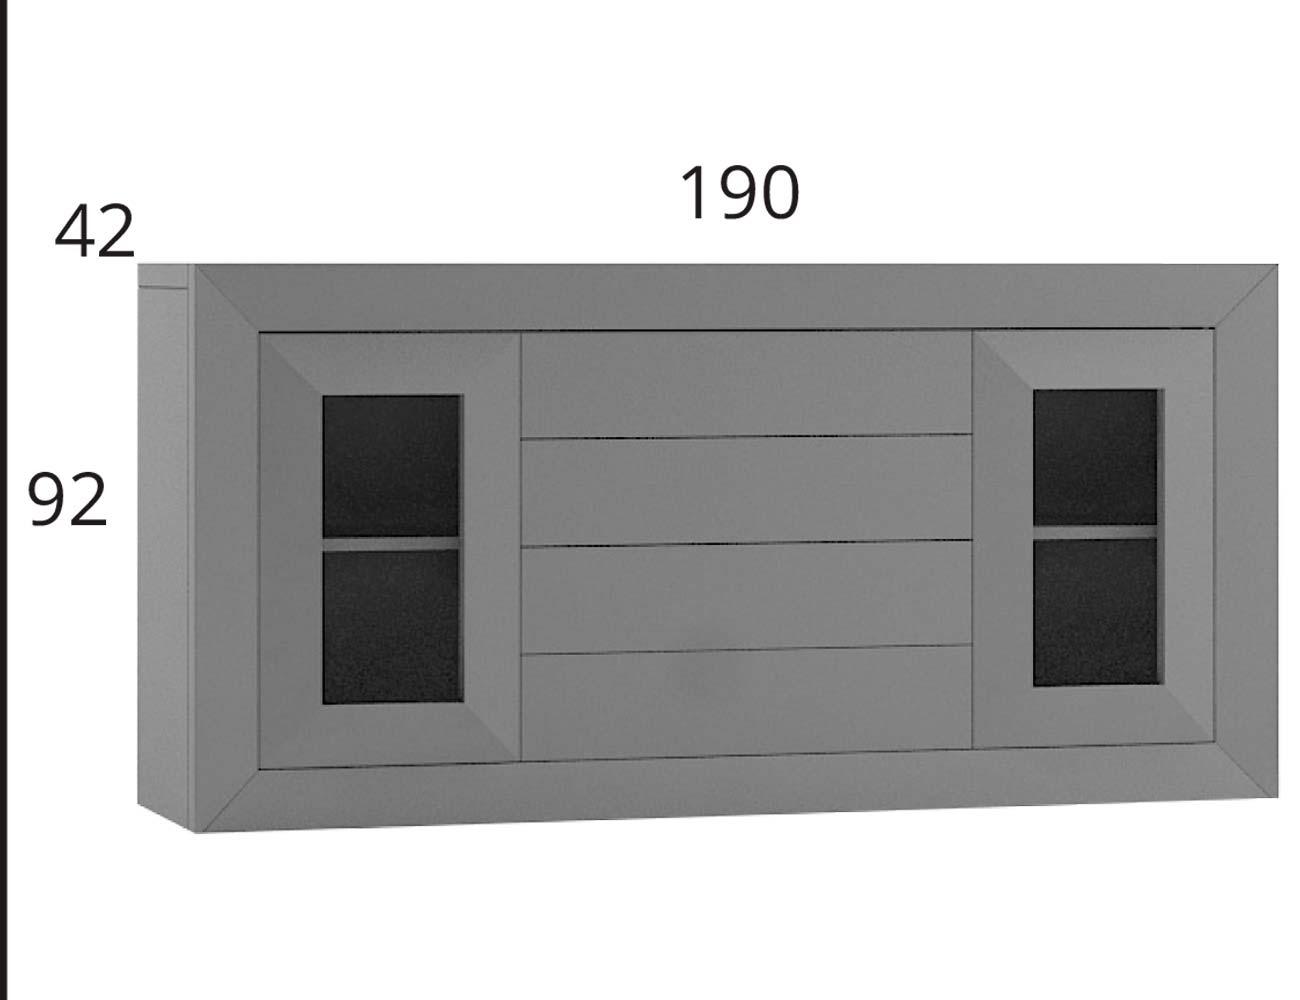 A0711